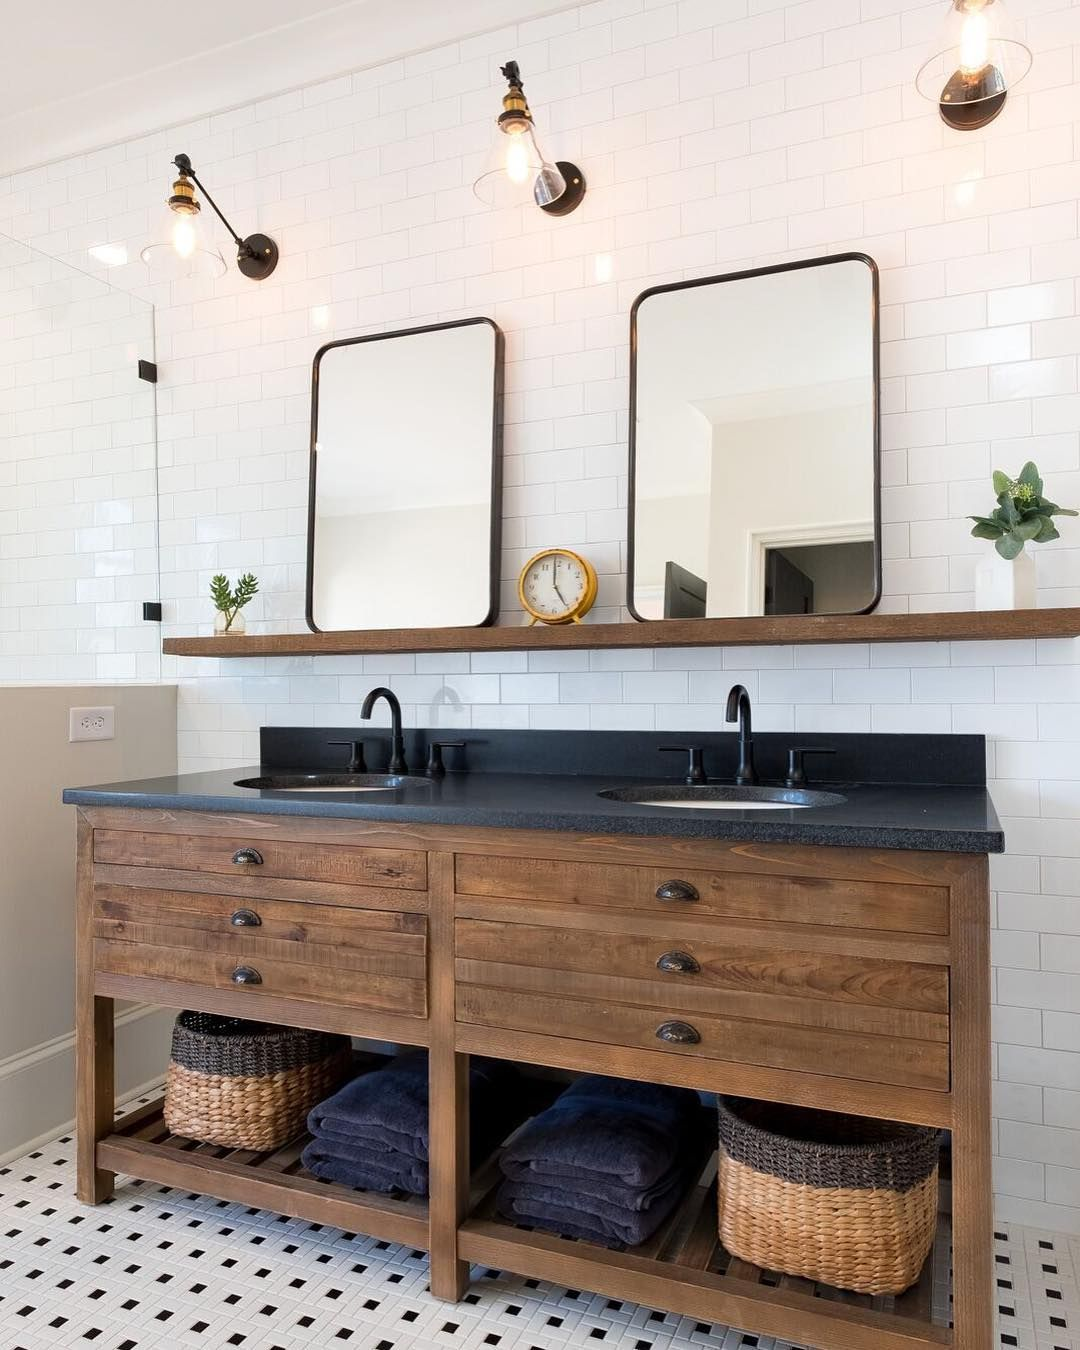 9 Bathroom Backsplash Ideas That Prove The Bathroom Can Be The